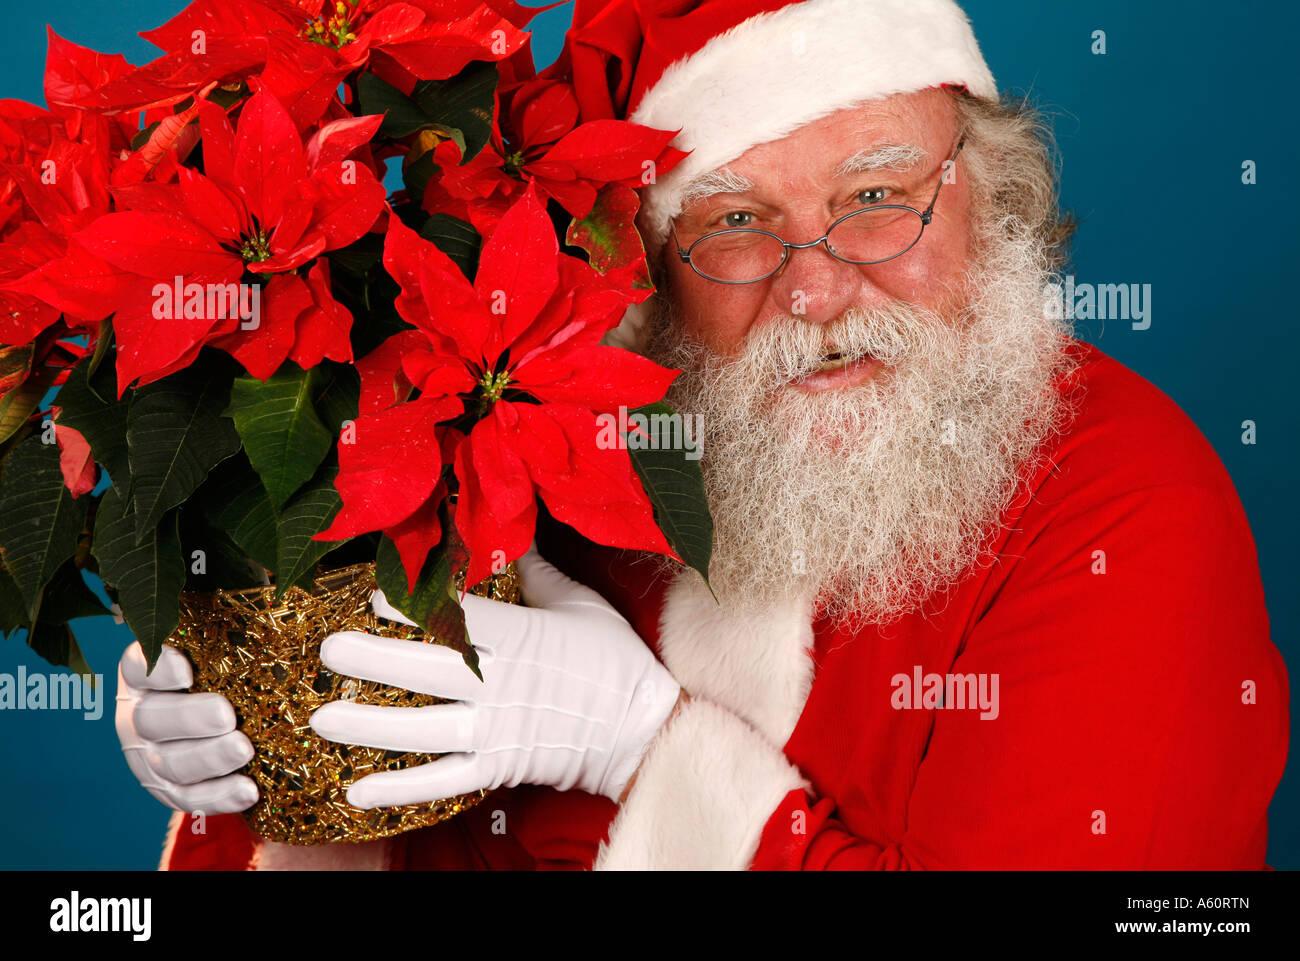 Santa Claus Holds A Poinsettia Plant Stock Photo Alamy